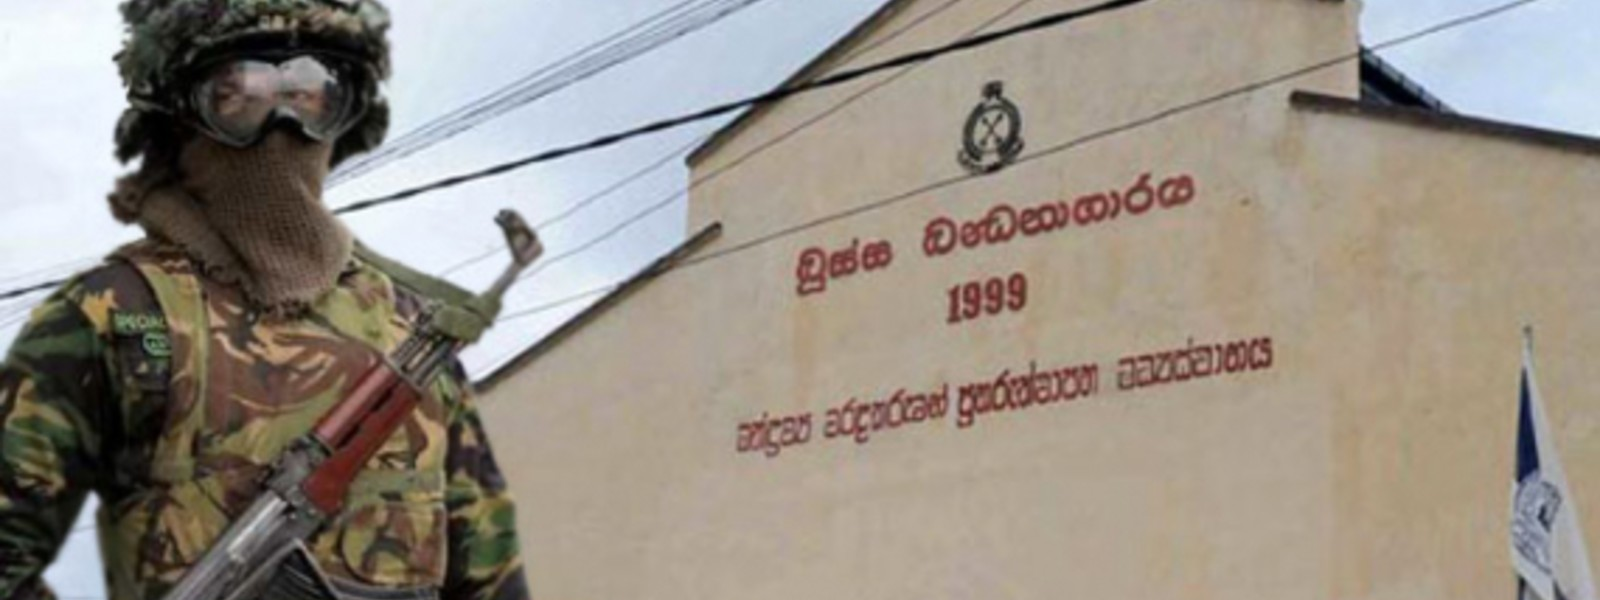 30 High-Profile criminals moved to Boossa Maximum-Security Prison